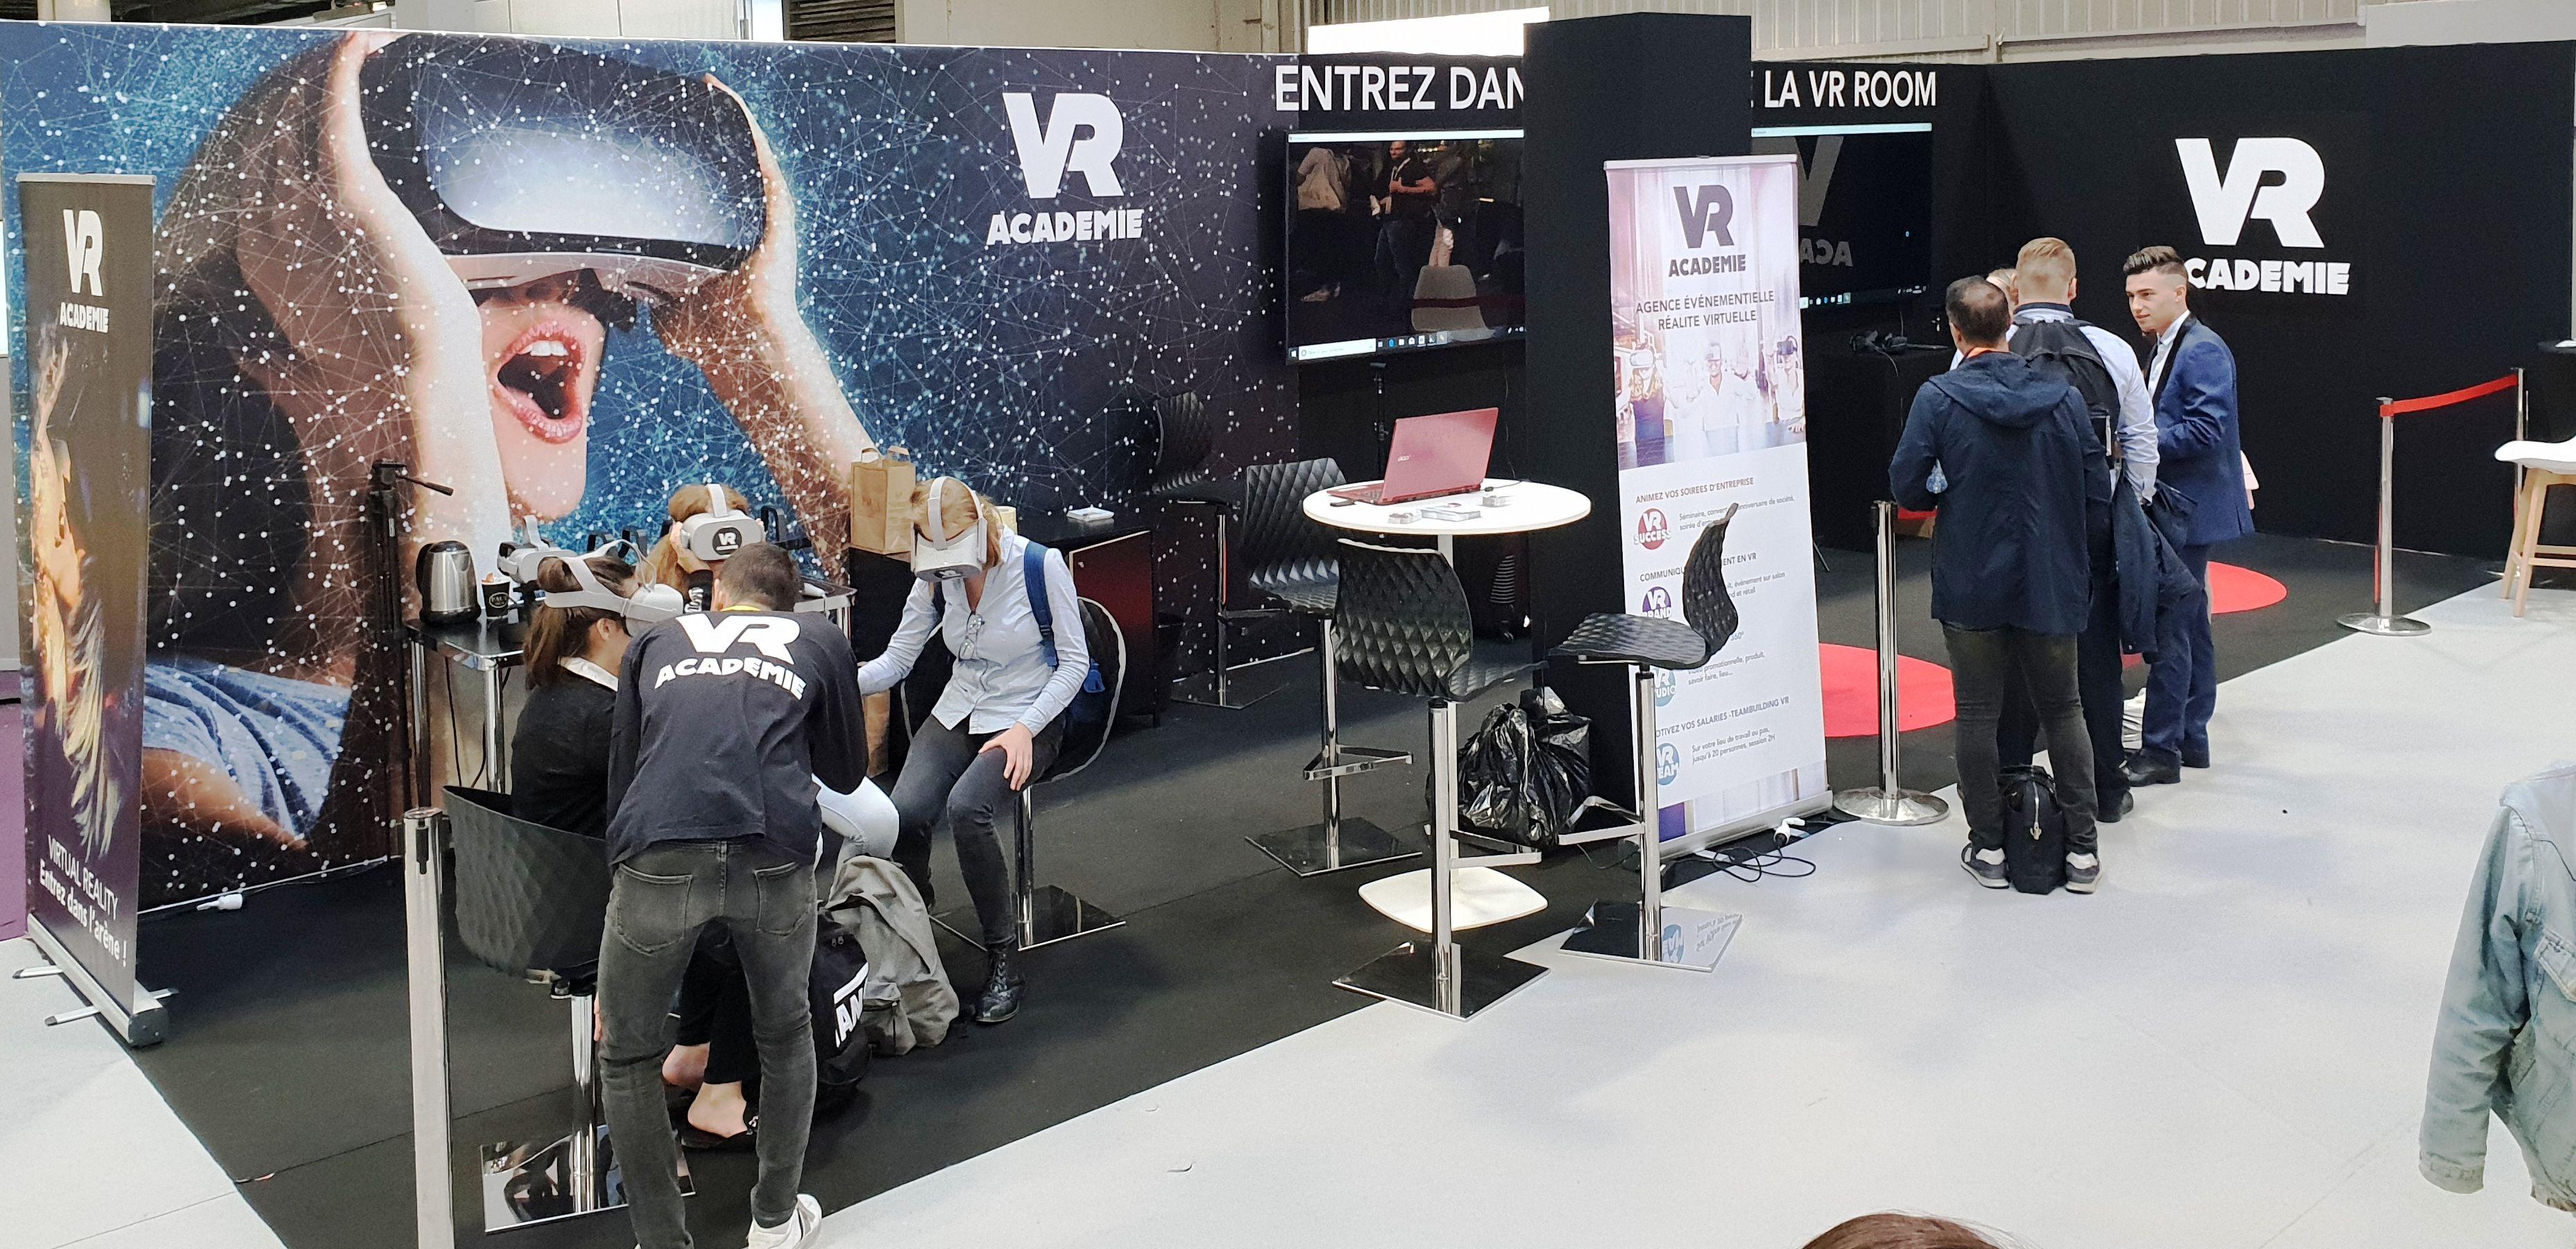 Animation-stand-salon-réalité-virtuelle-vr-academie-1mb